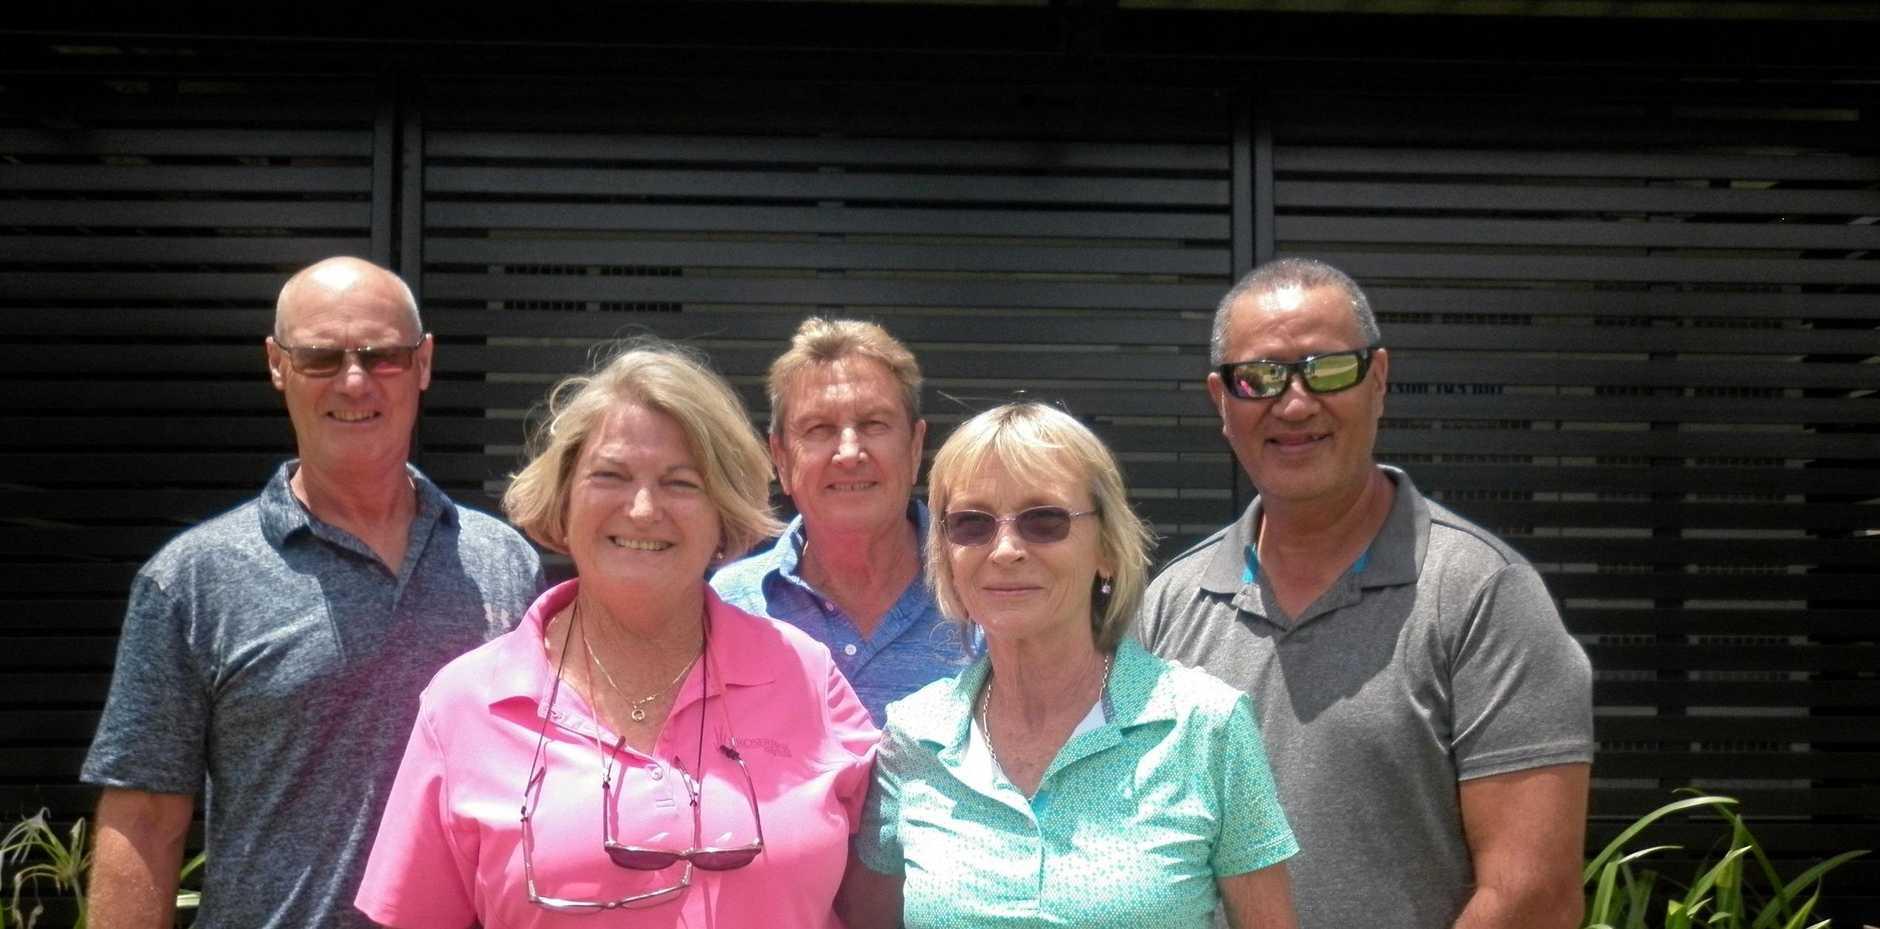 Whitsunday Golf's leading lights. Back row : Geoff Harrison,  Ernie Holstein, Ricardo Tauri; Front row : Anna Winterbourn, Sally Little.